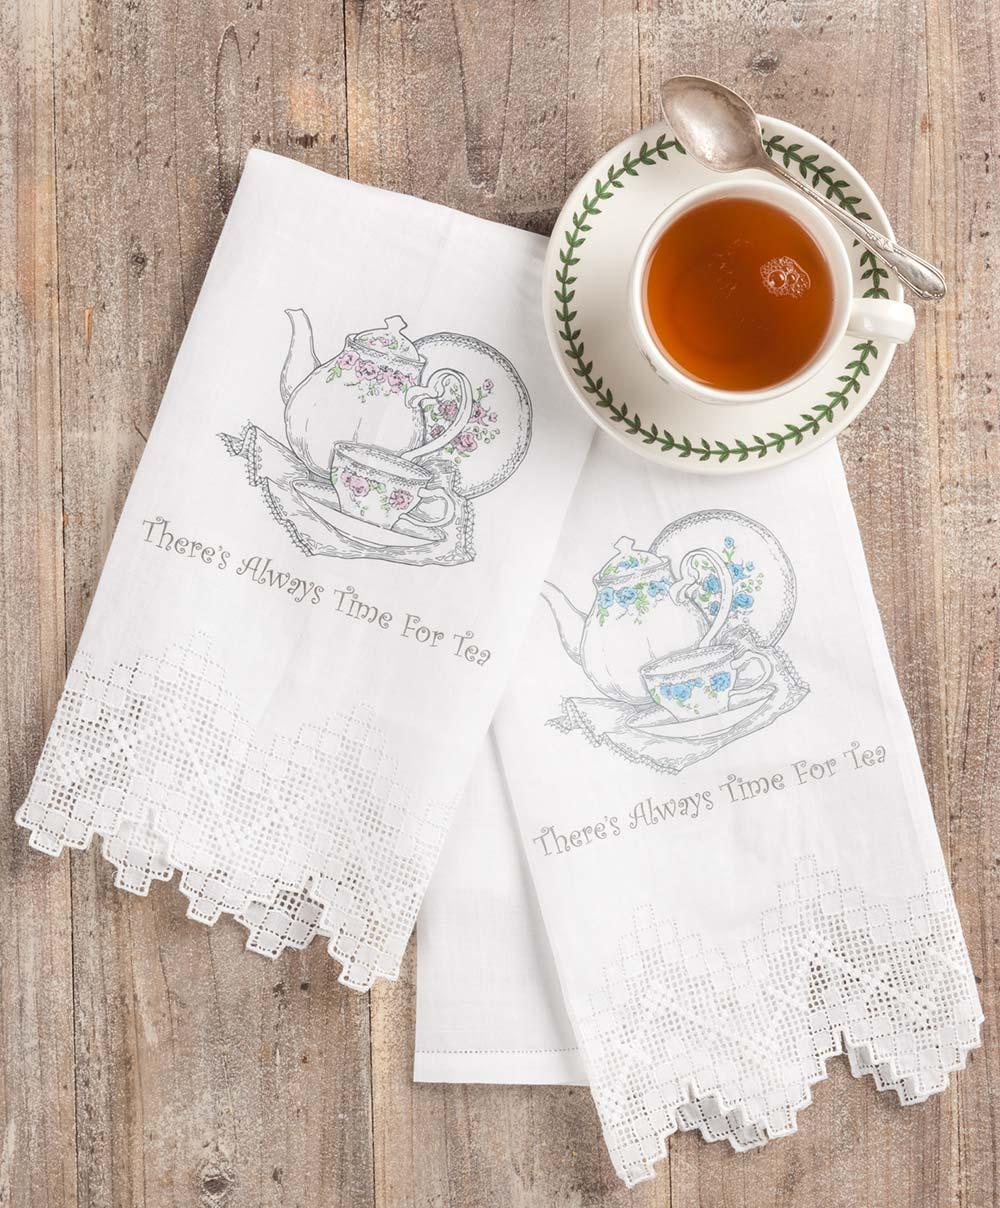 Tea Towel - Always Time for Tea